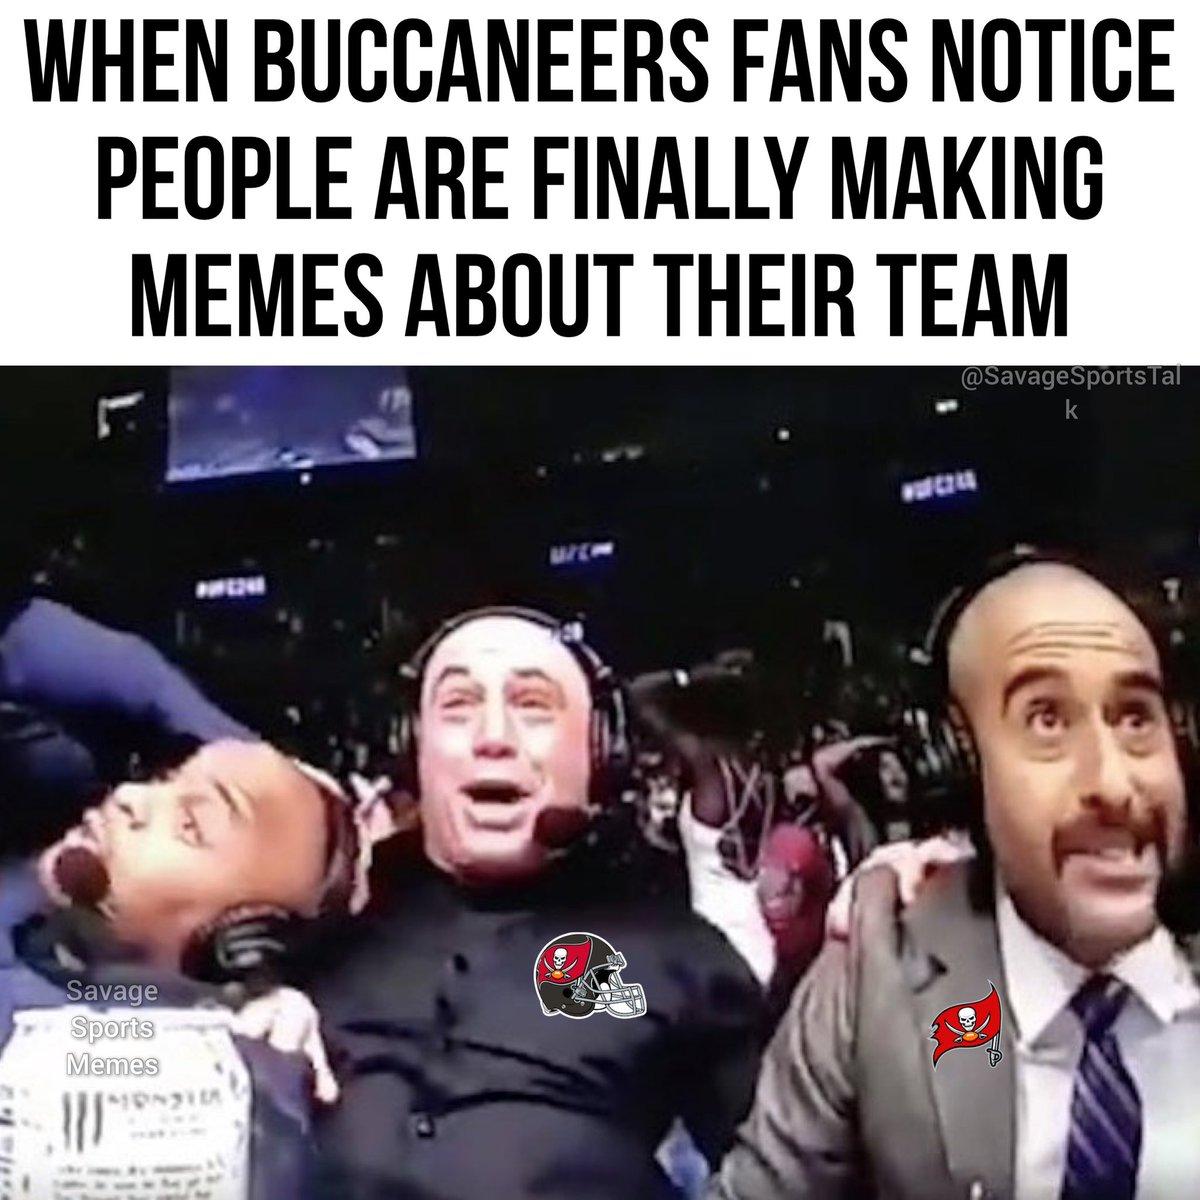 #NFL #NFLmeme #NFLmemes #football #footballmeme #footballmemes #meme #memes #sports #sportsmeme #sportsmemes #tampabay #bucs #buccaneers #tombrady #tb12pic.twitter.com/DLrn0UwD5w